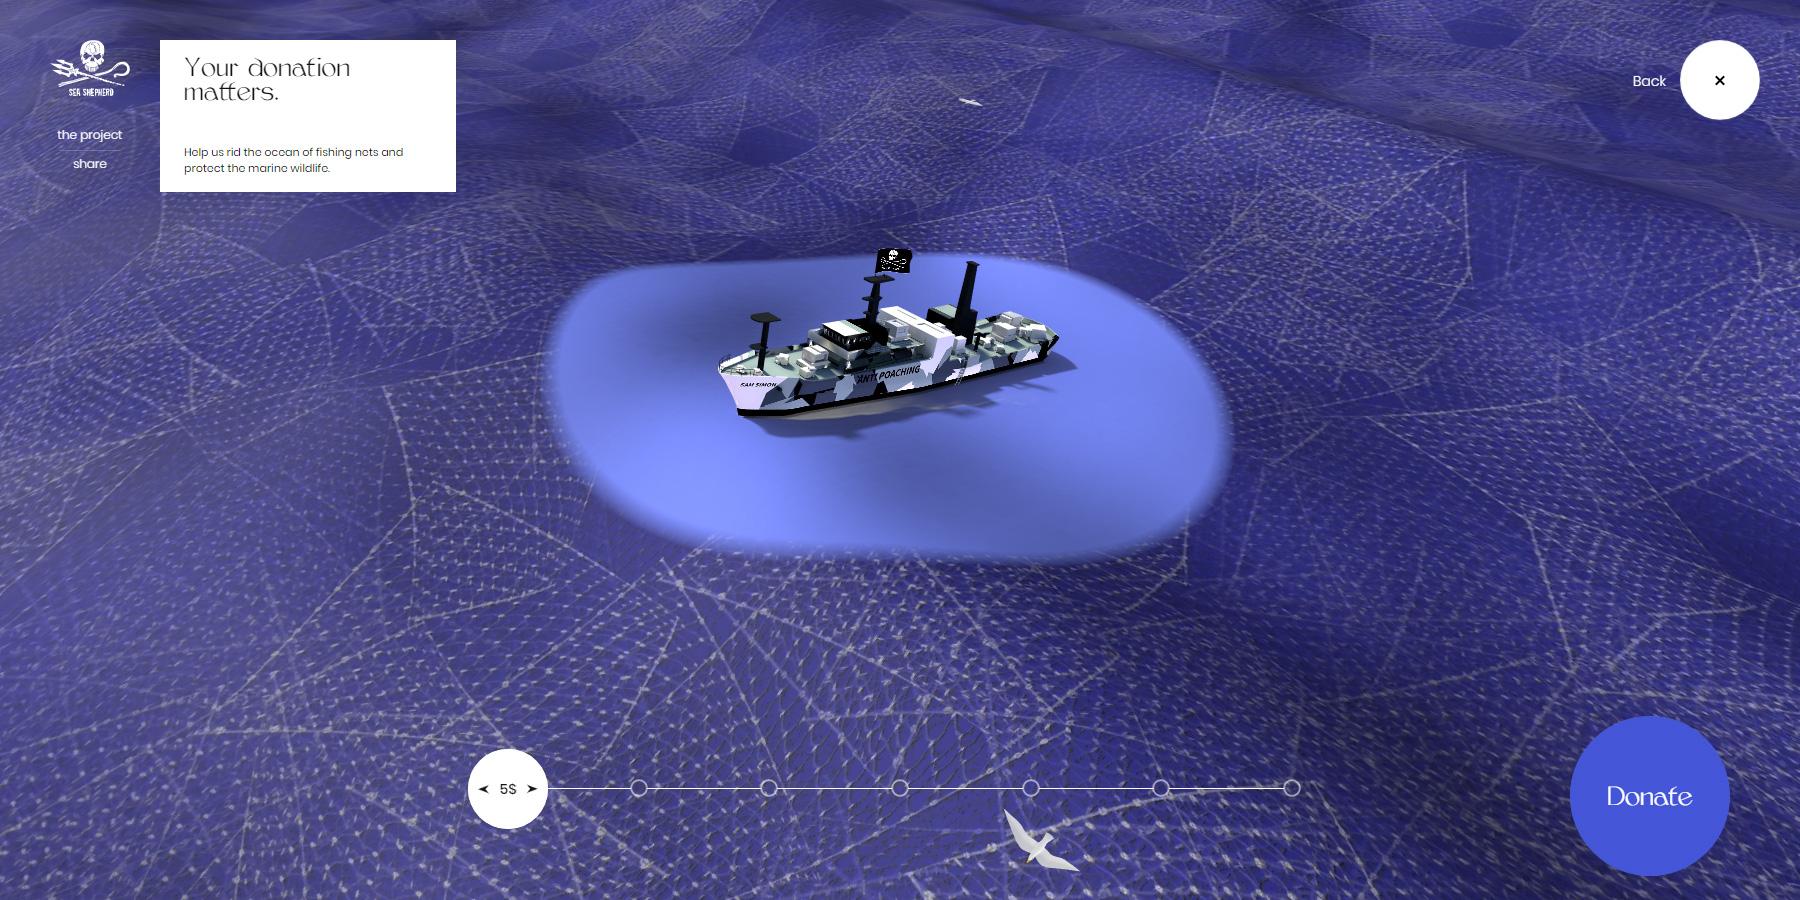 Sea Shepherd - No fishing net - Website of the Day